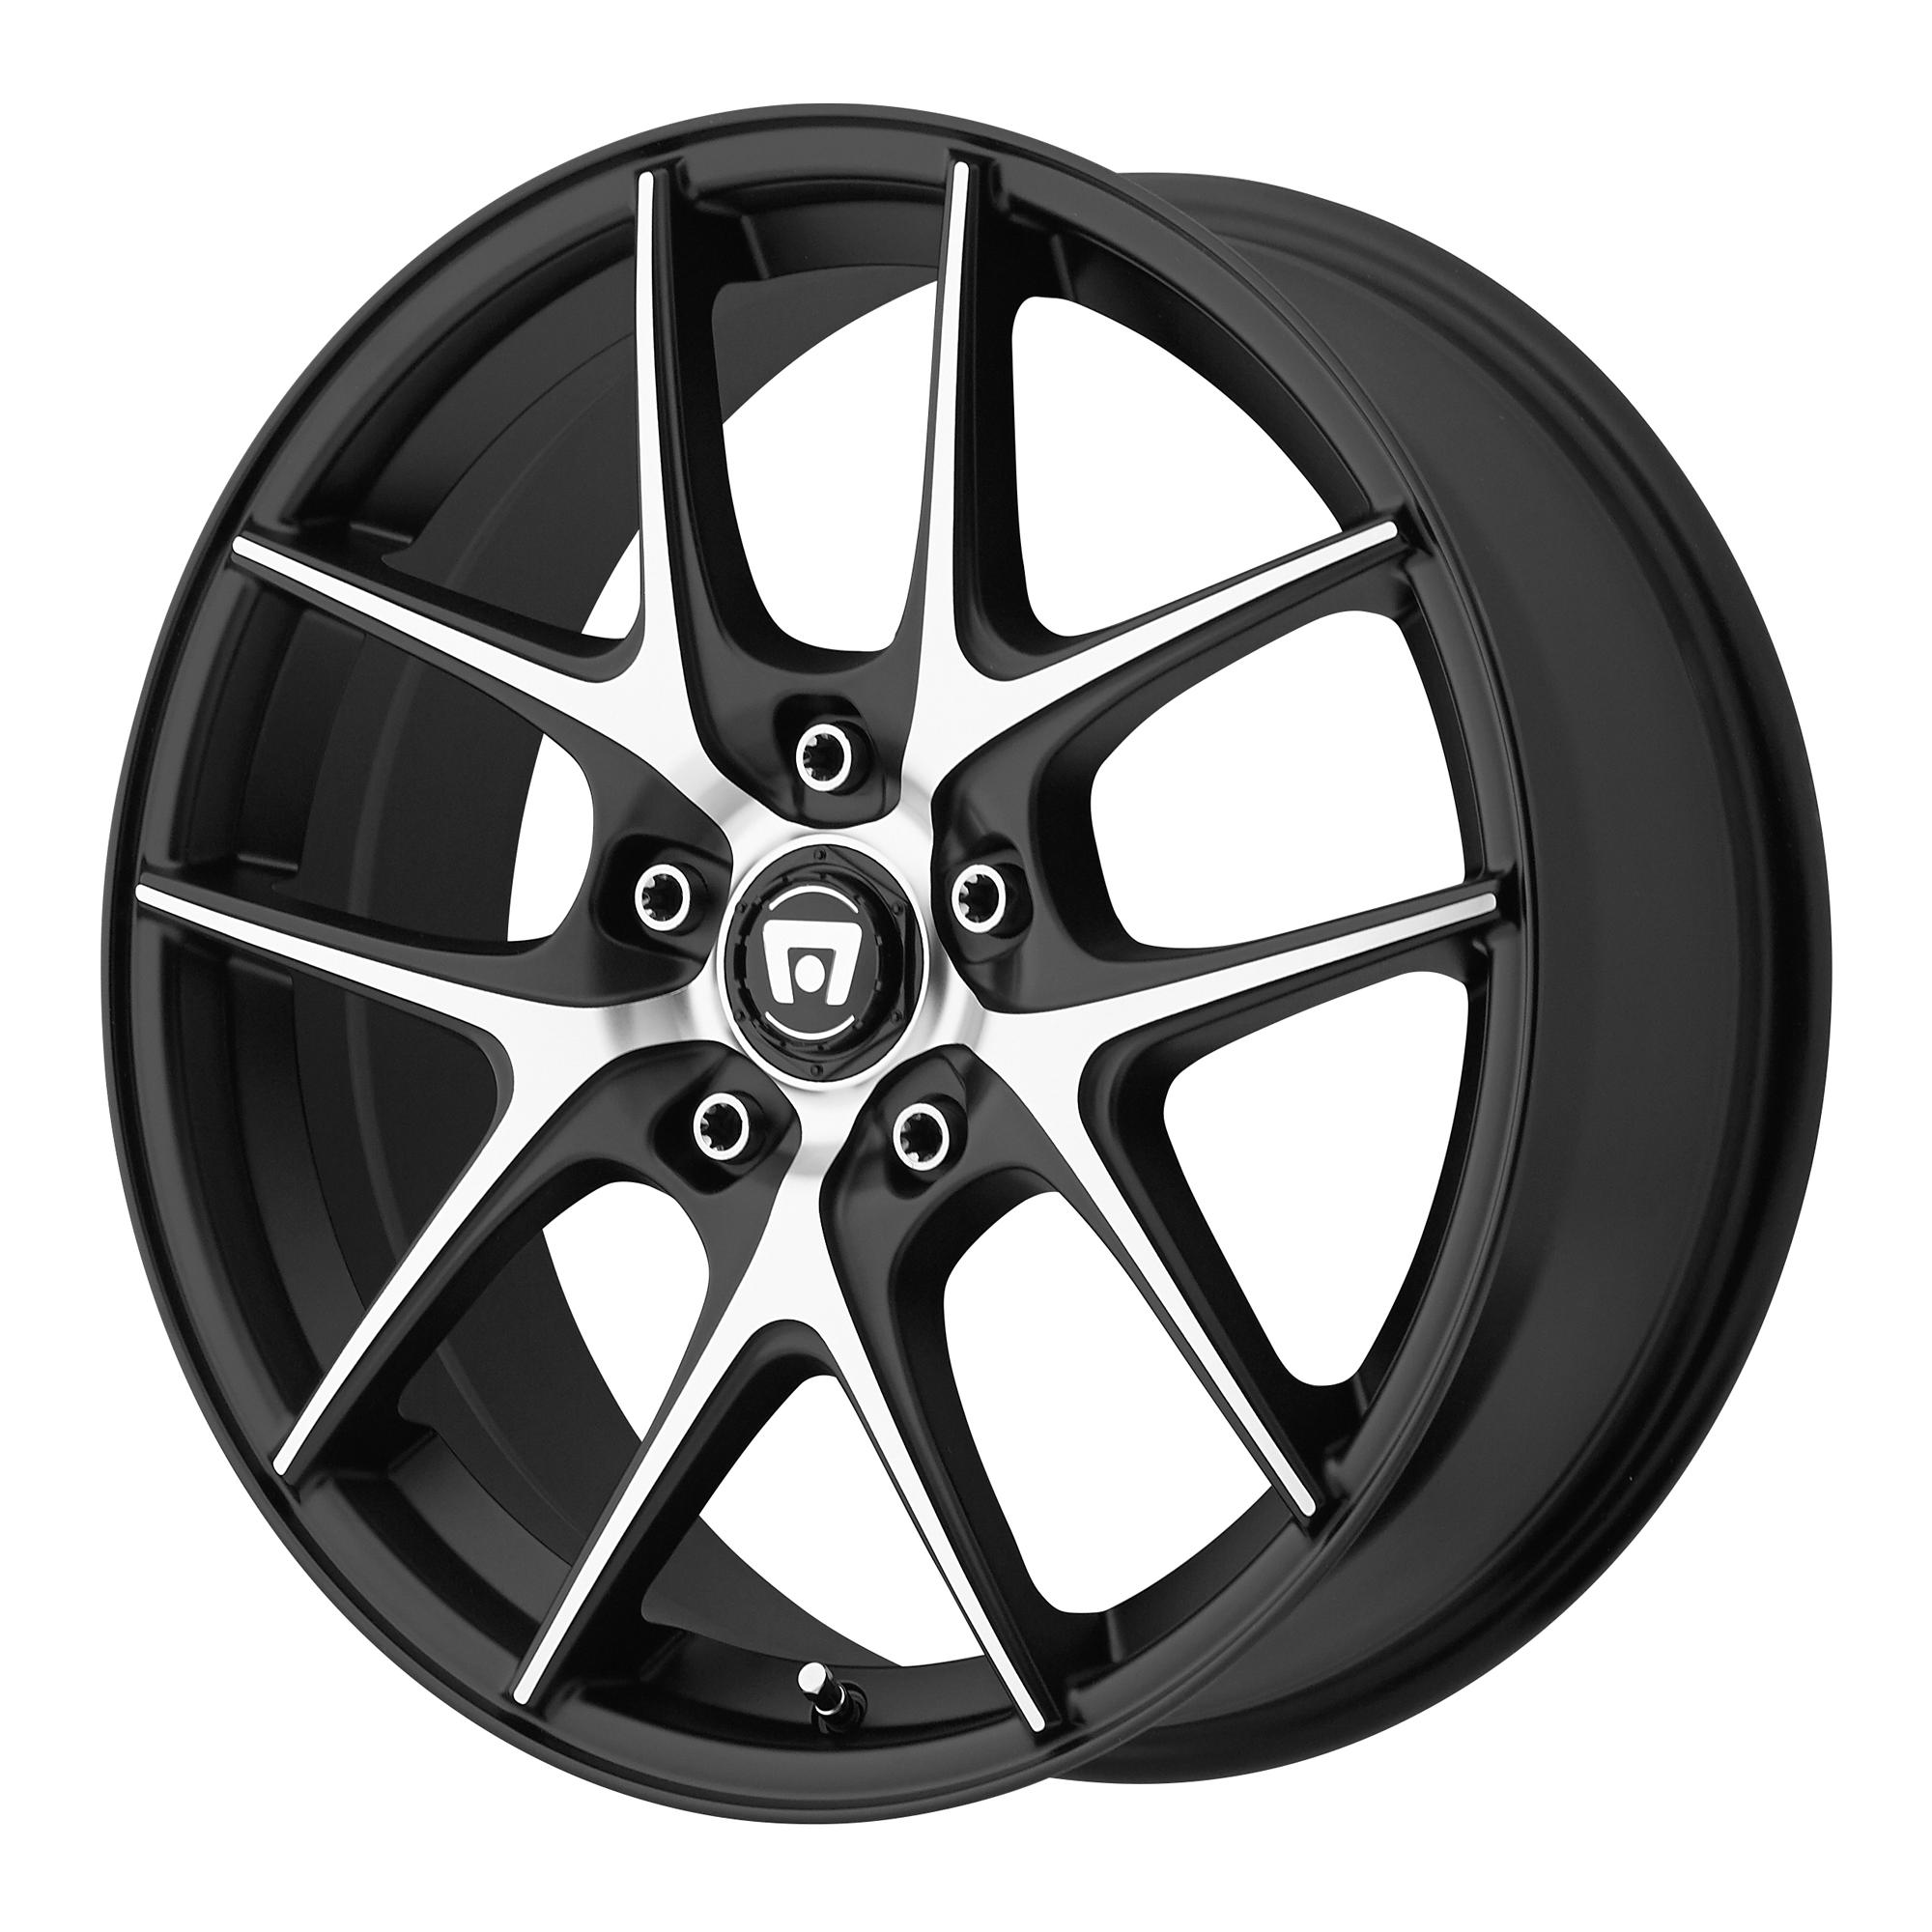 Motegi Racing Wheels MR128 Satin Black w/ Machined Face